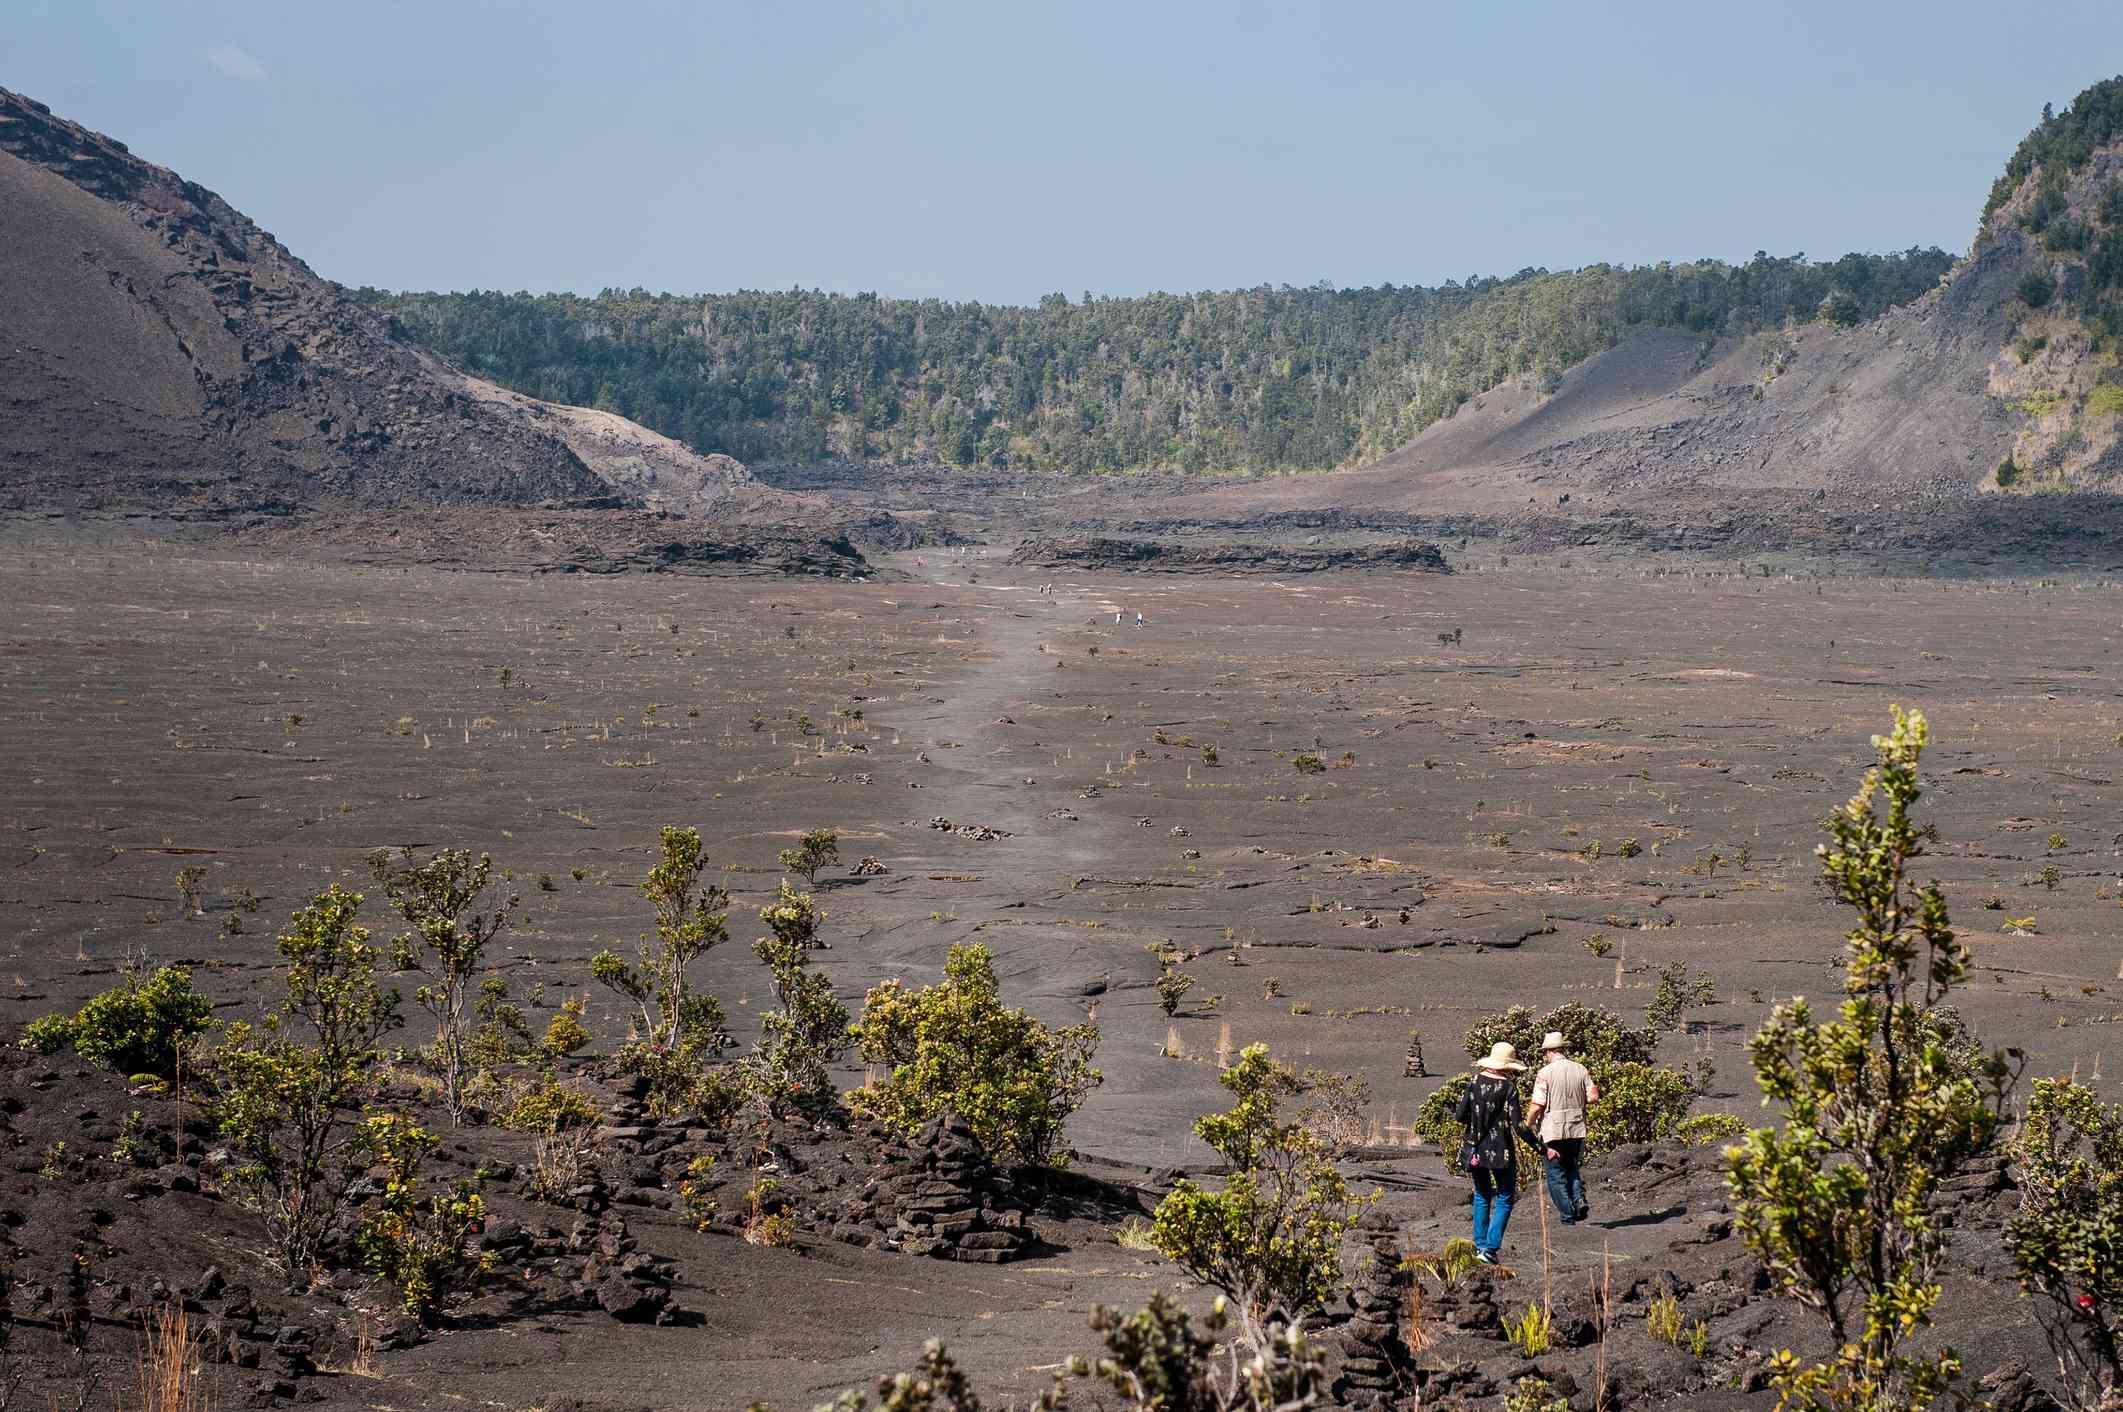 Kilauea Iki Crater in Hawaii Volcanoes National Park